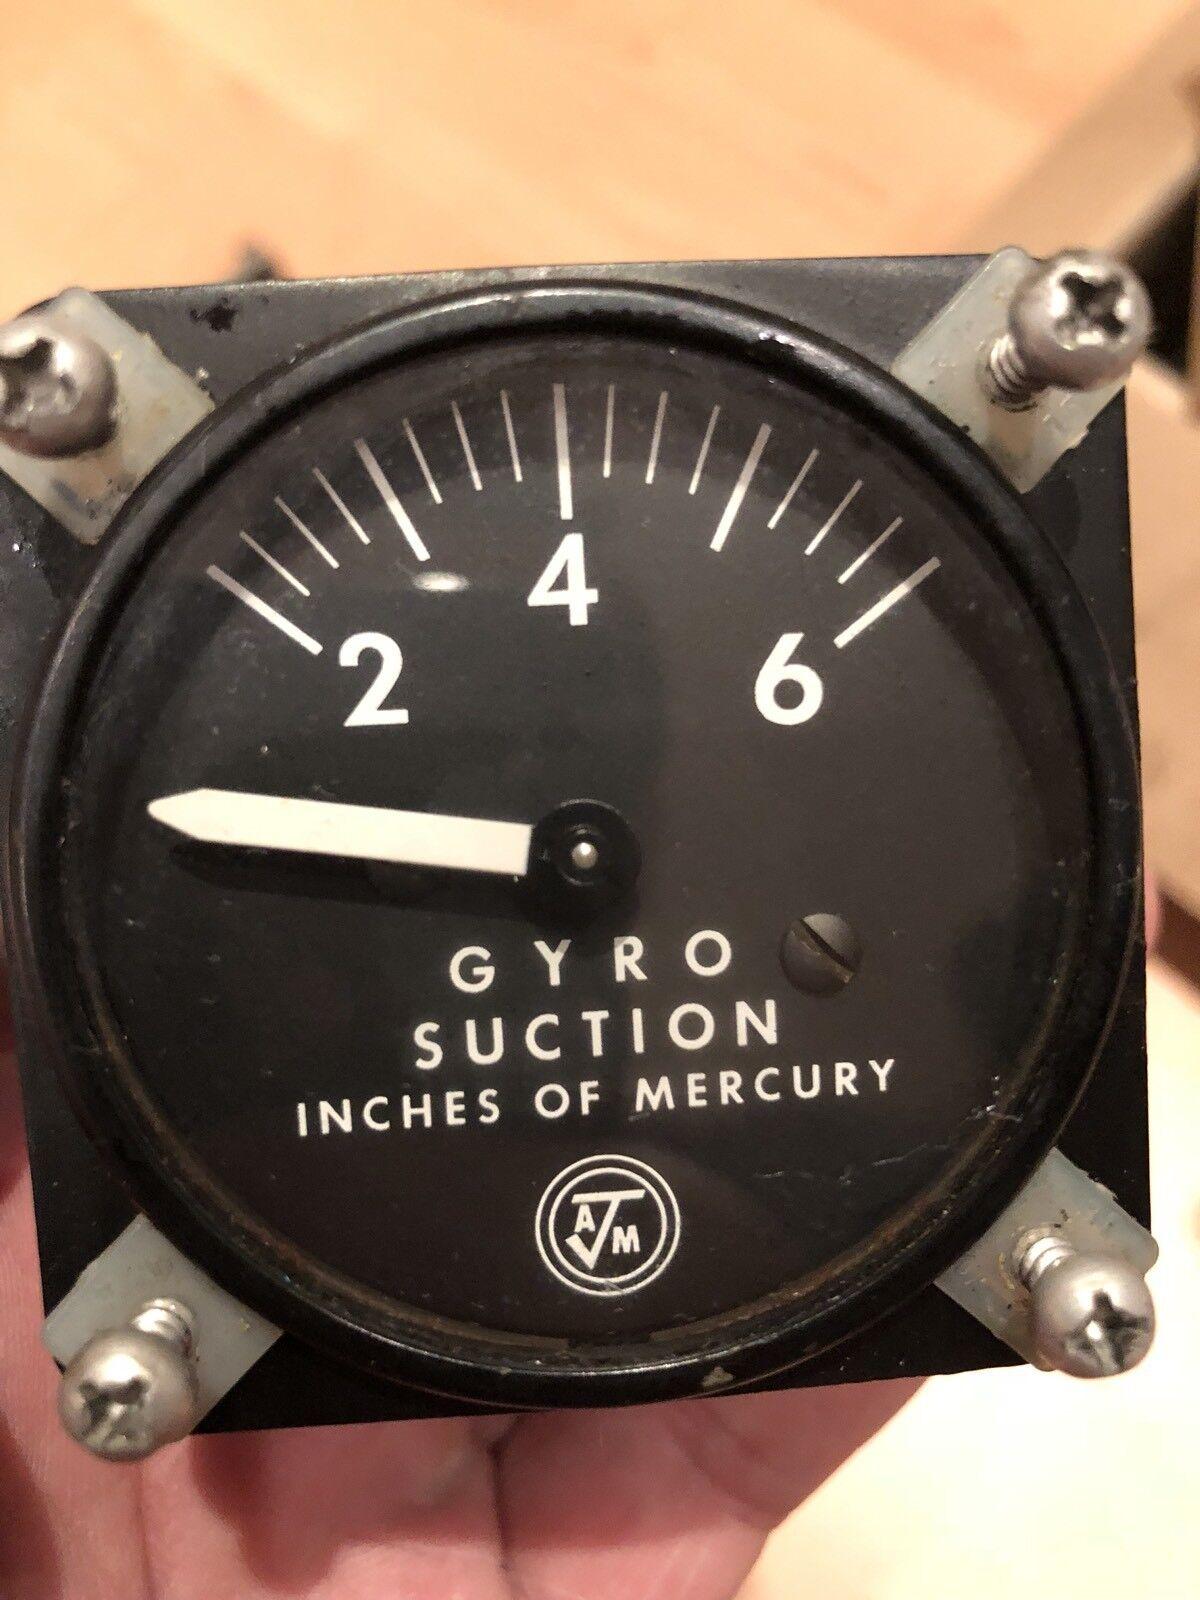 Airborne MFG Gyro suction Gauge P N 1g3-4